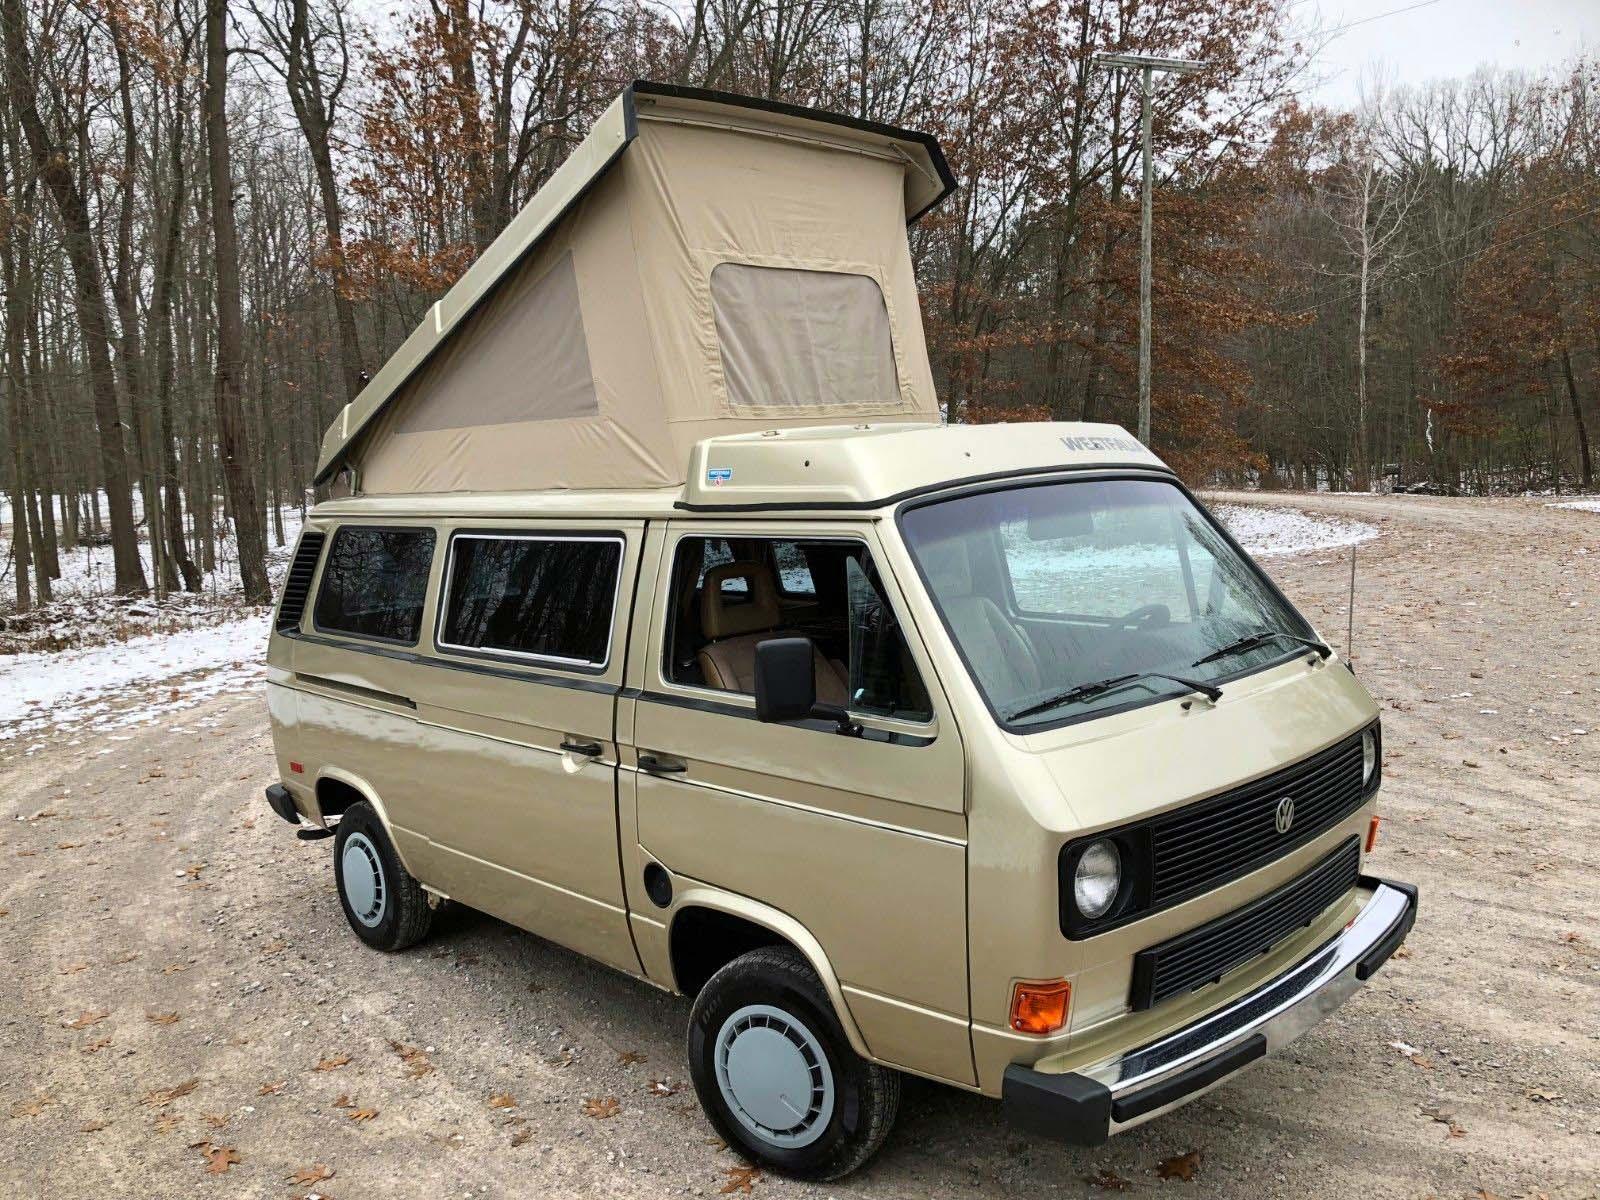 1985 VW Vanagon Westfalia Camper 125k miles michigan WV2ZB0254FH107350